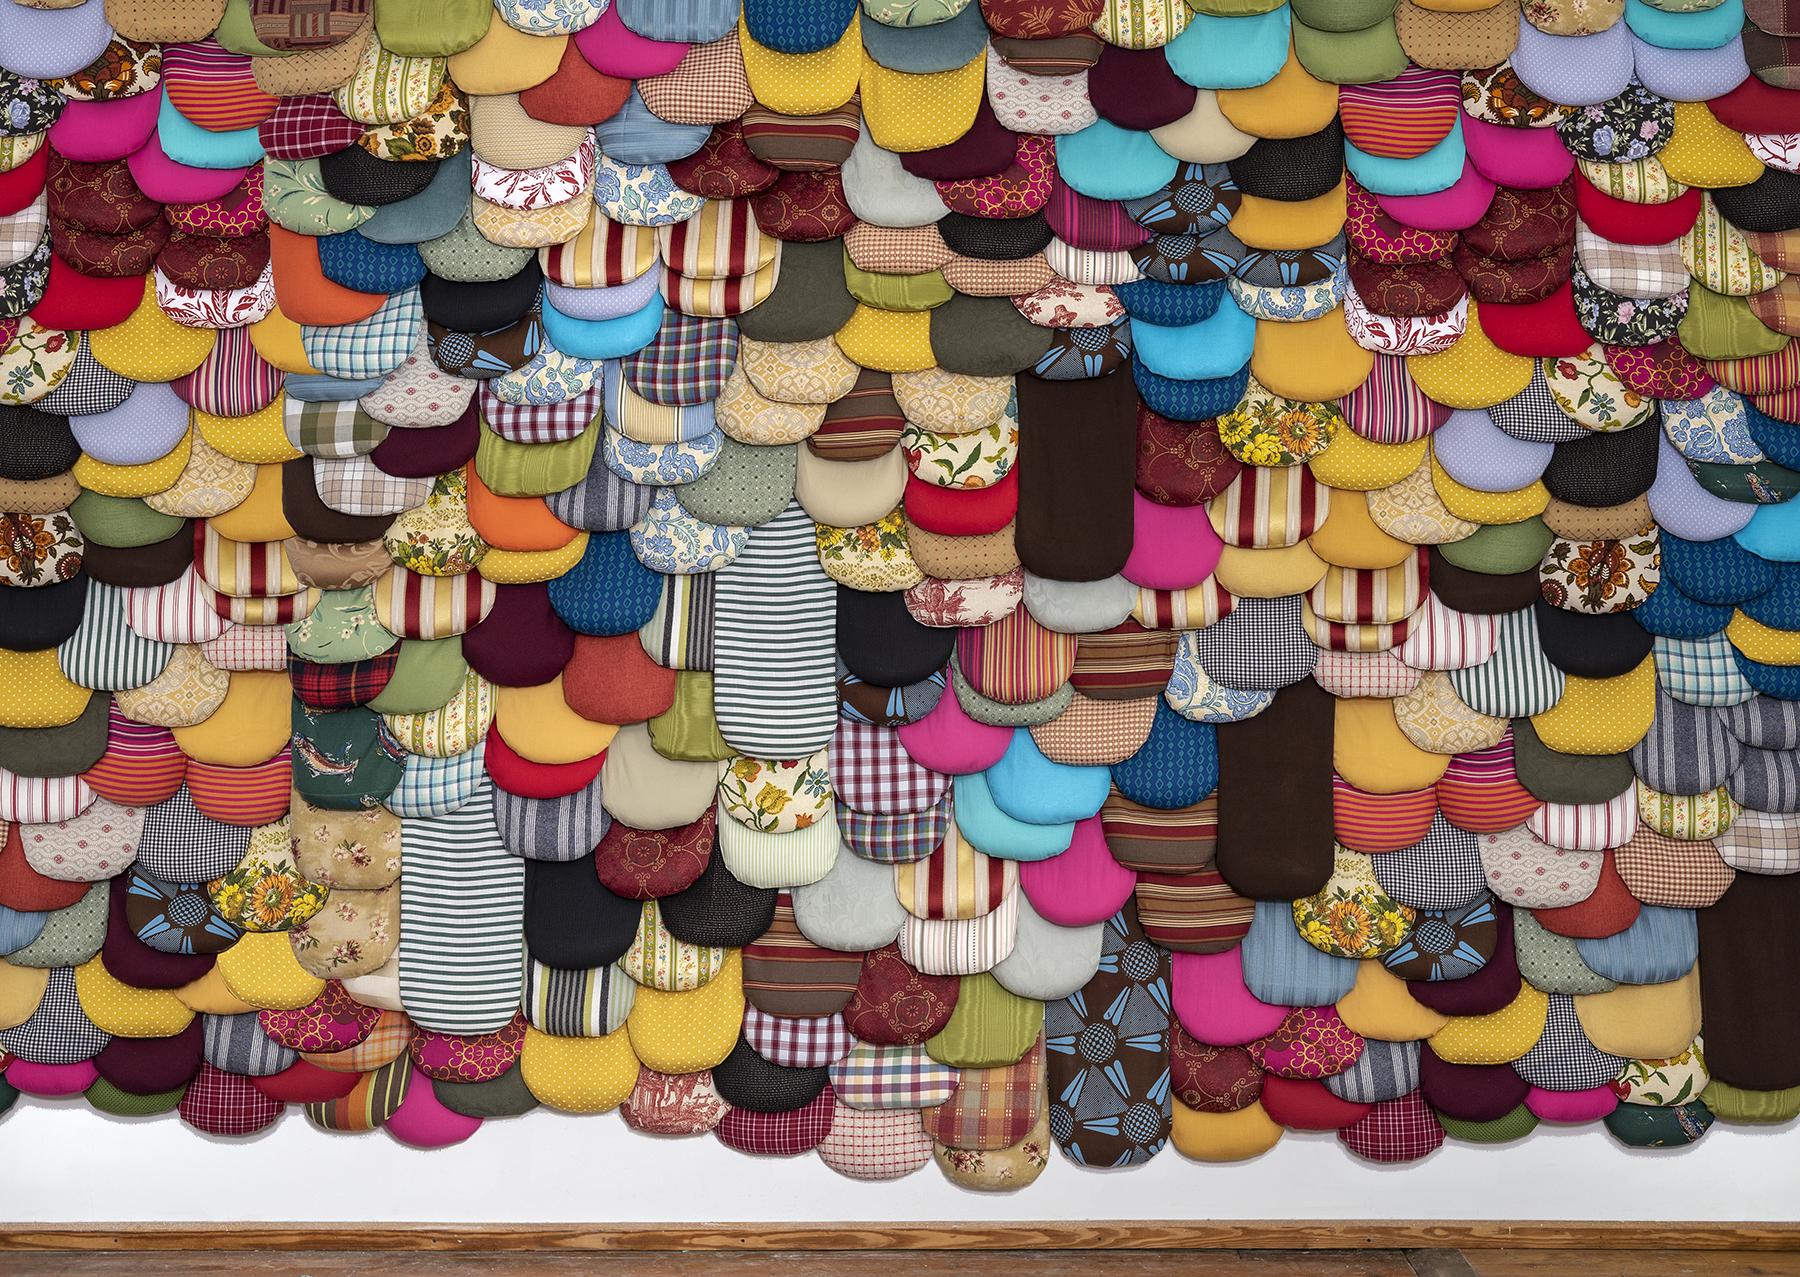 Virtual | Artist Talk with Shelley Spector